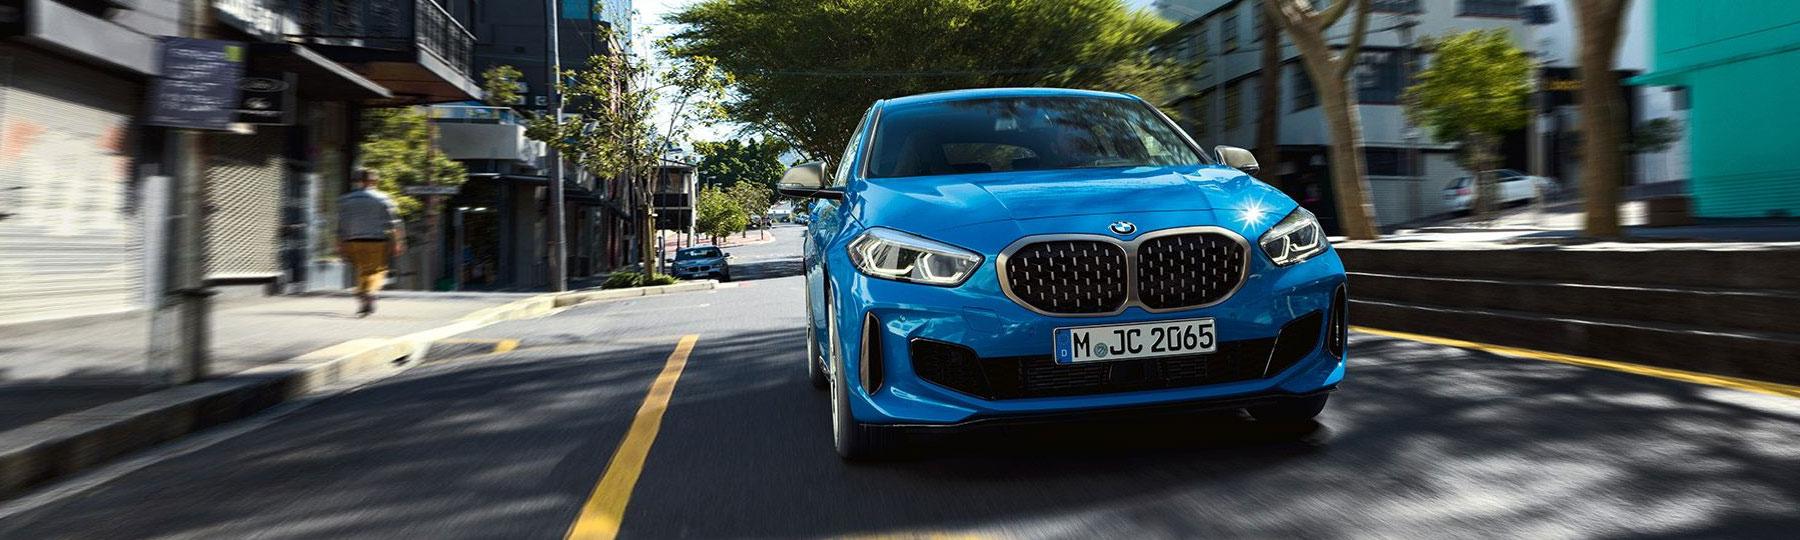 BMW 1 Series Sports Hatch New Car Offer